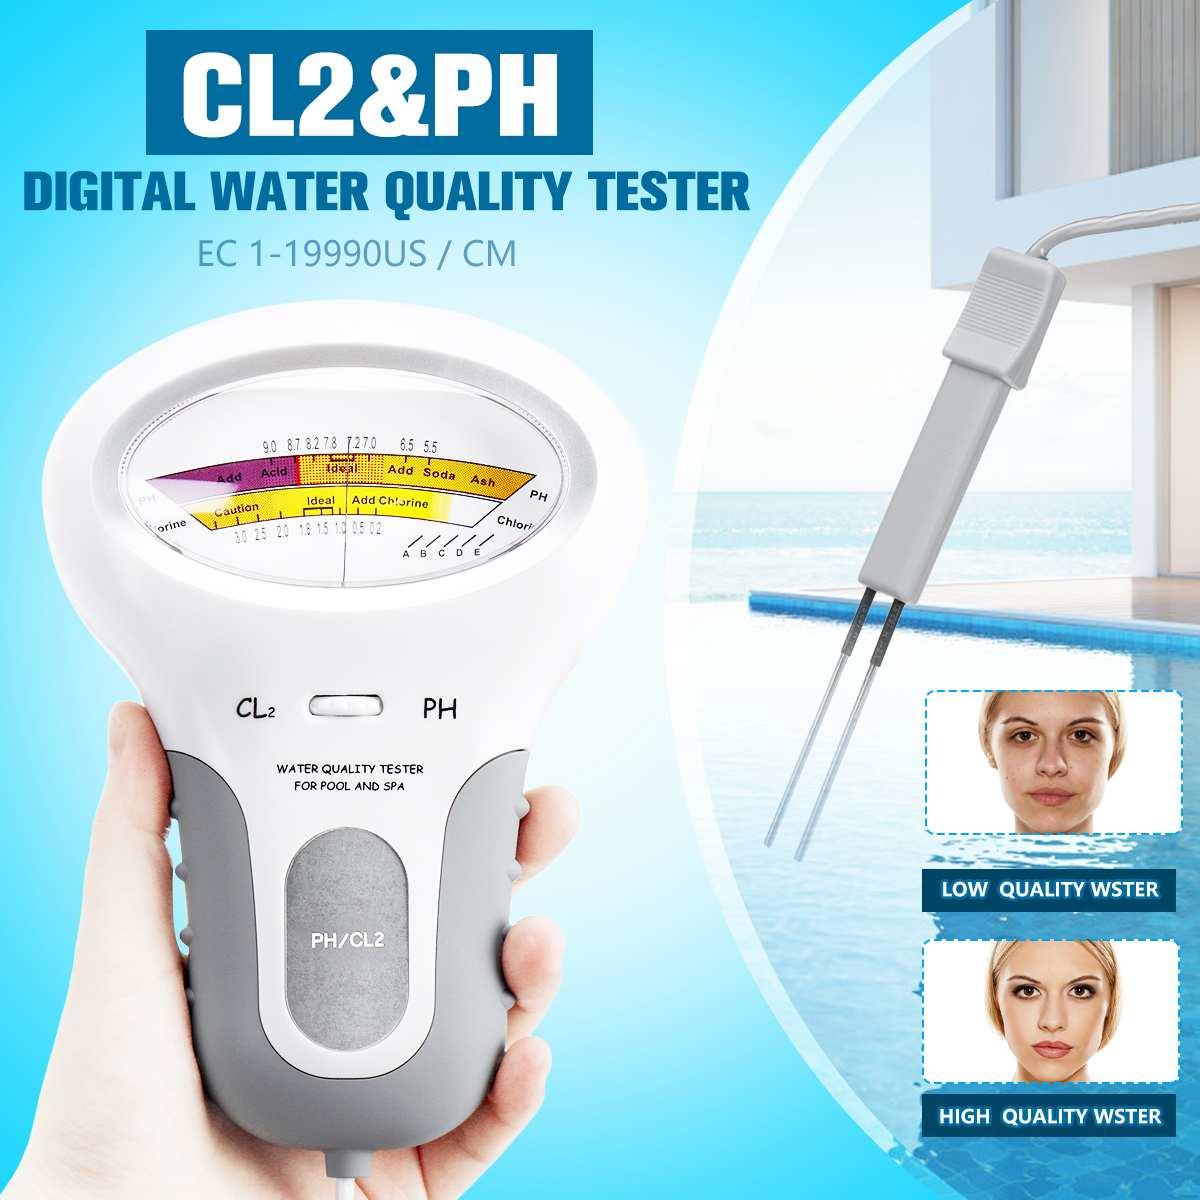 1Pcs PC-101 PH Meter CL2 Chlorine Water Quality Tester Portable Home Swimming Pool Spa Aquarium PH Test Monitor White 2 Styles